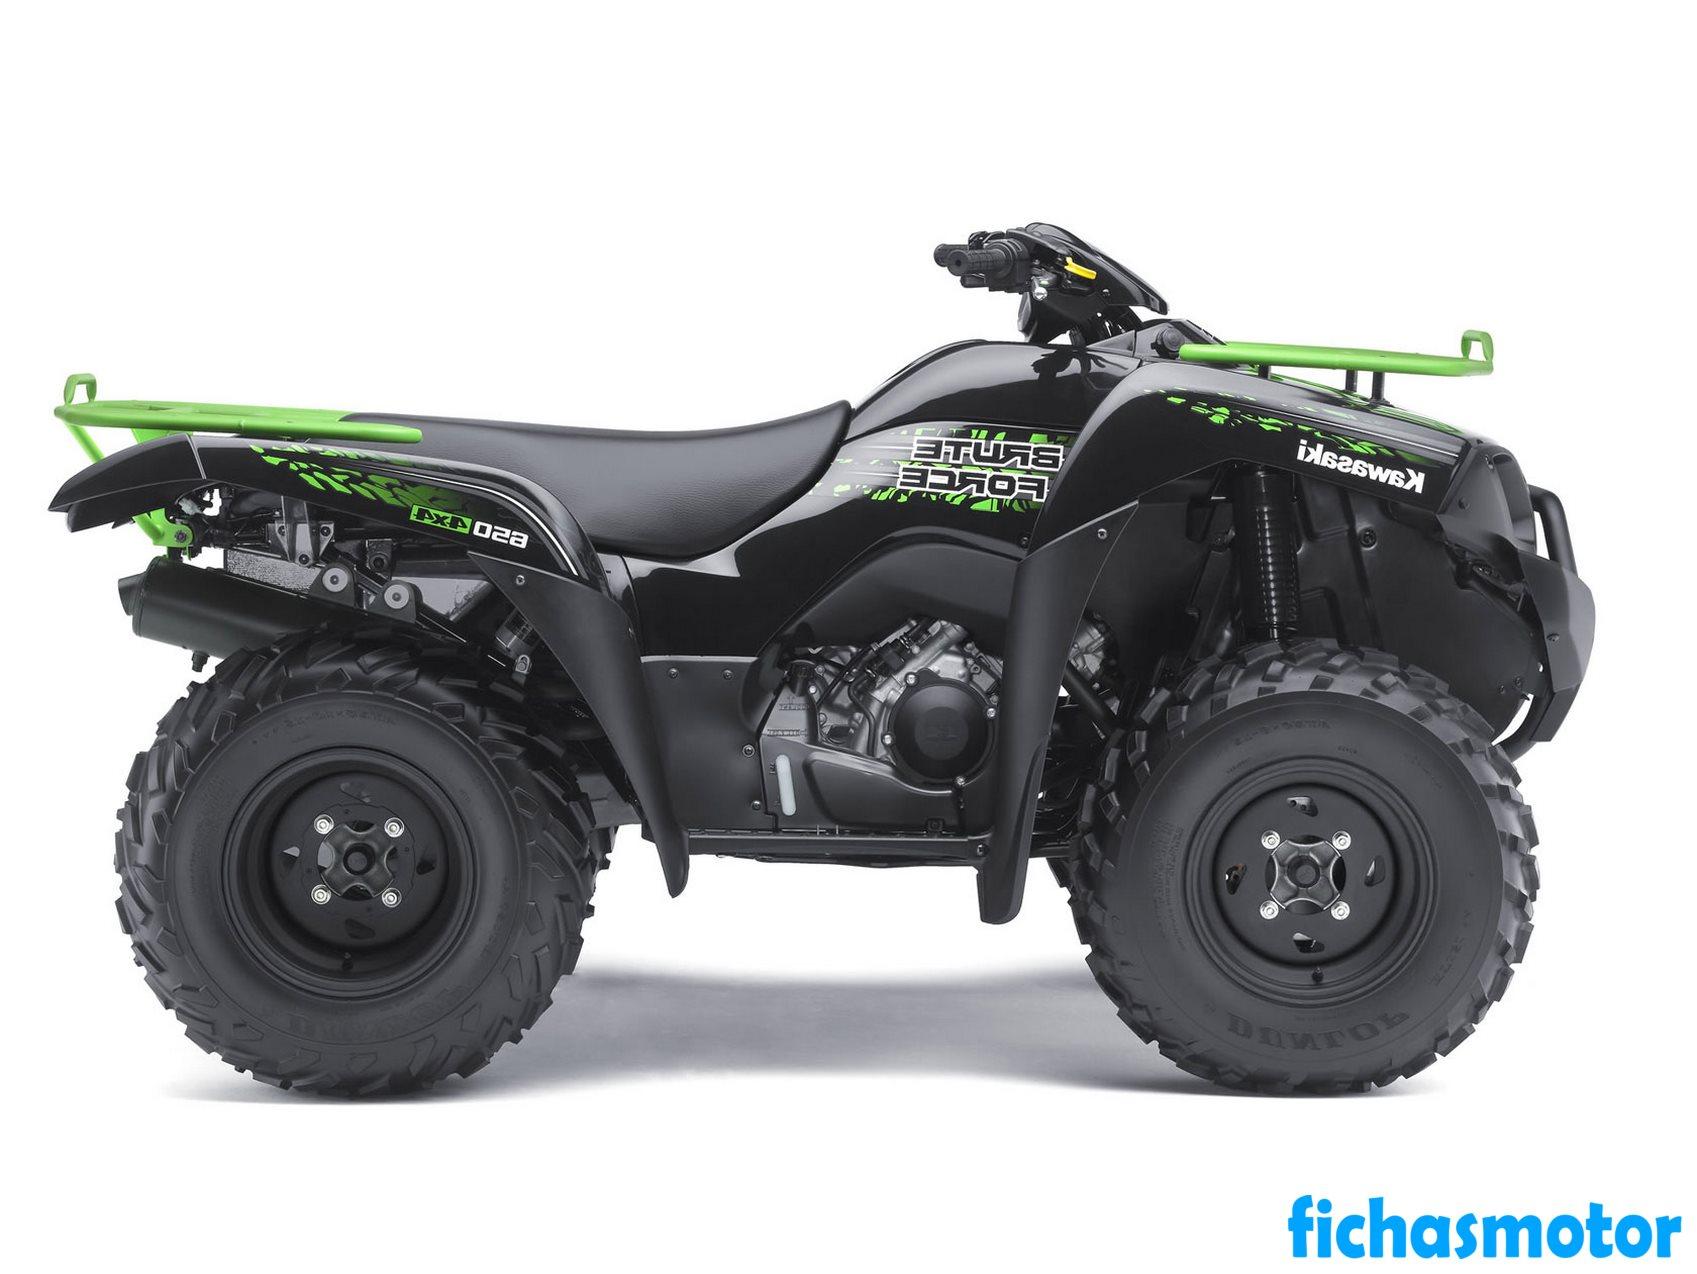 Imagen moto Kawasaki brute force 650 4x4 año 2011